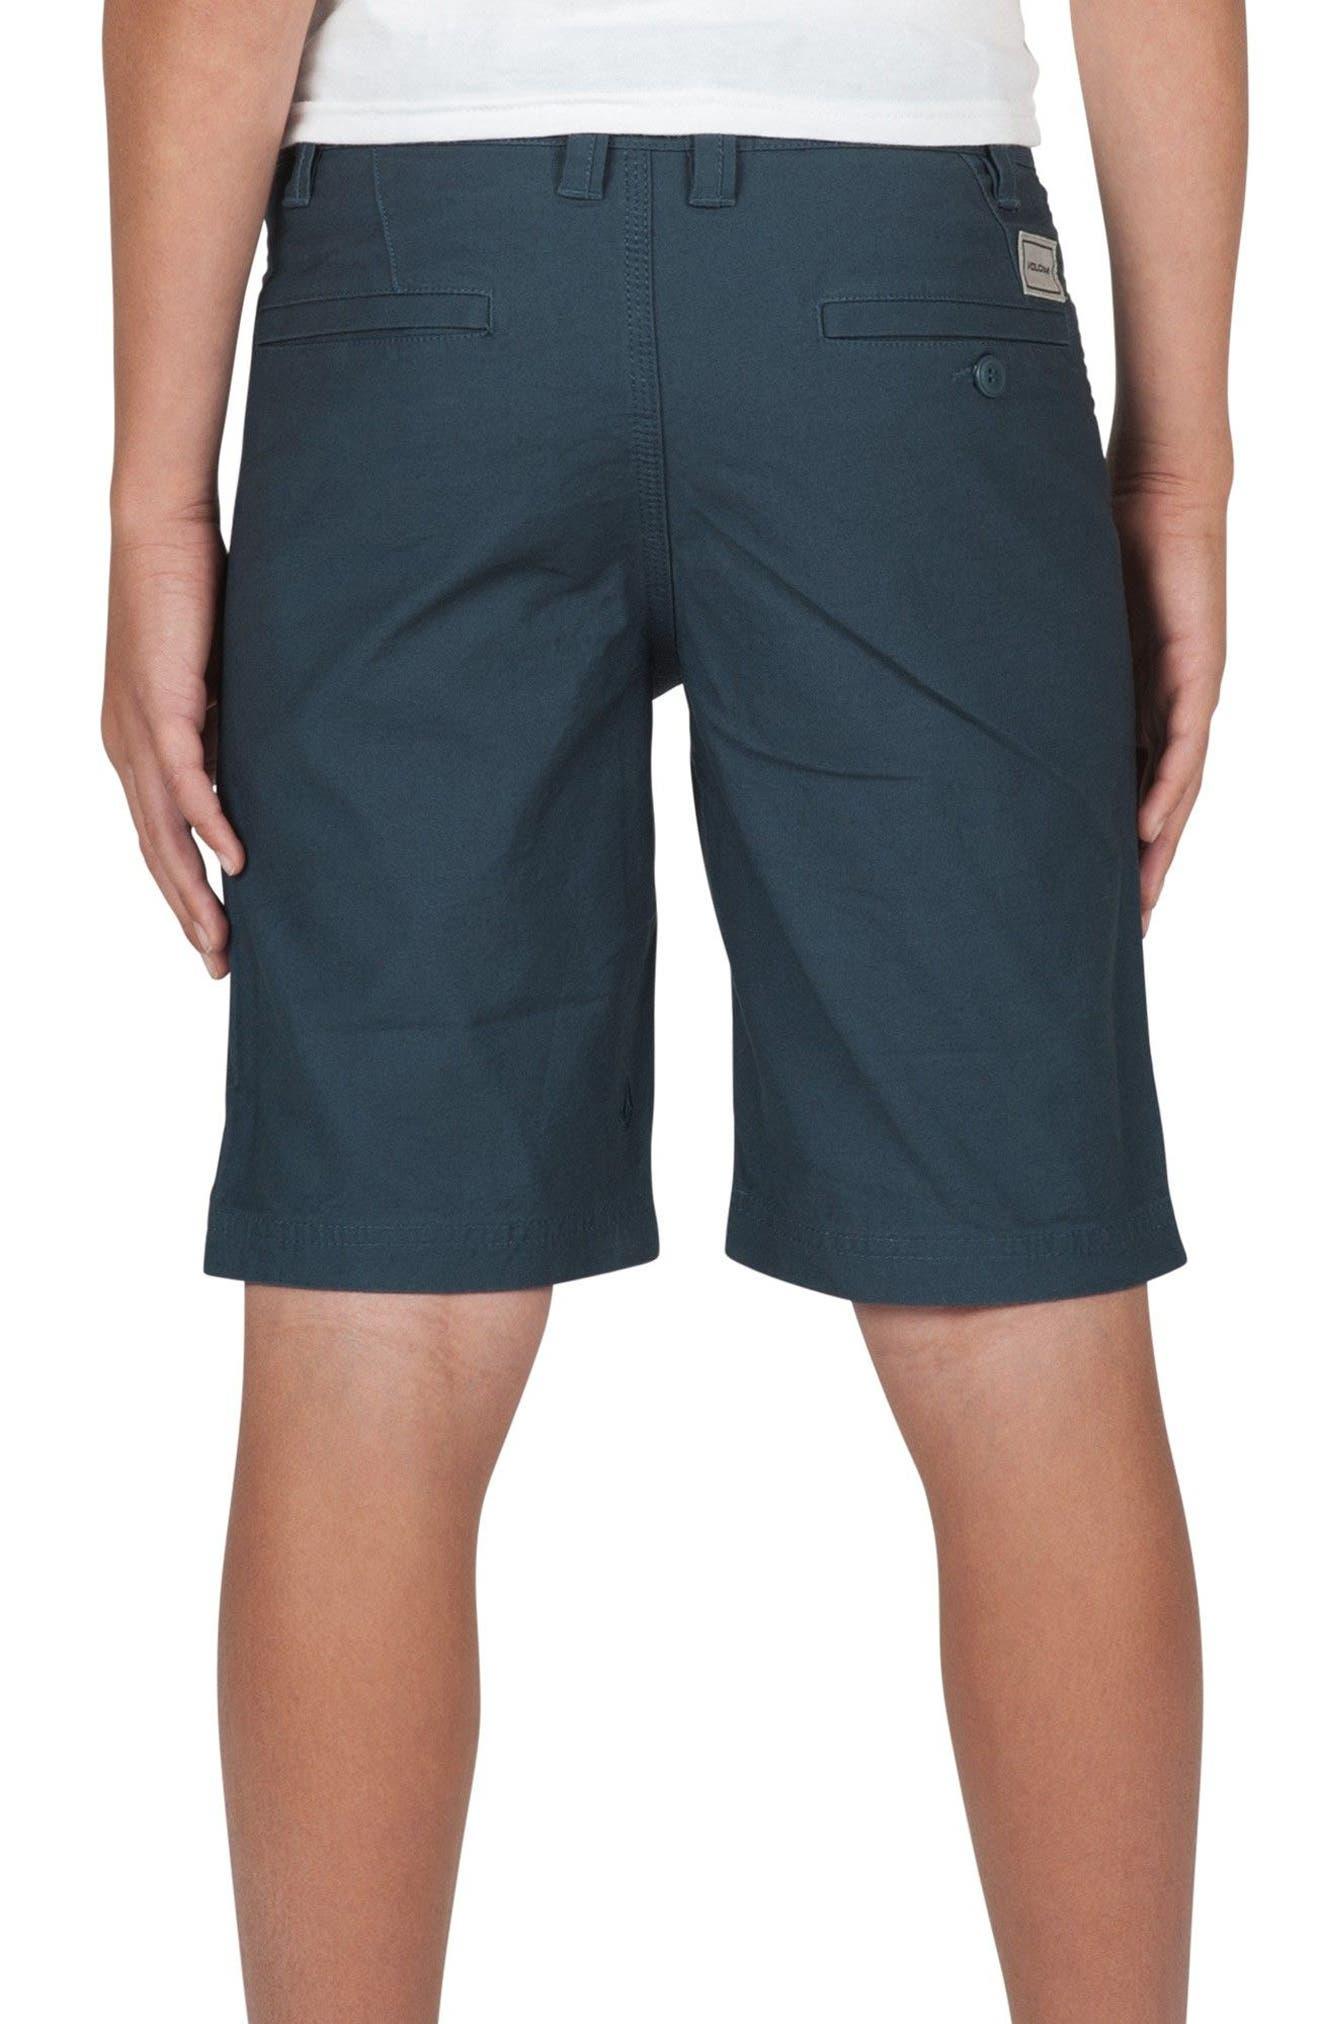 VSM Gritter Chino Shorts,                             Alternate thumbnail 4, color,